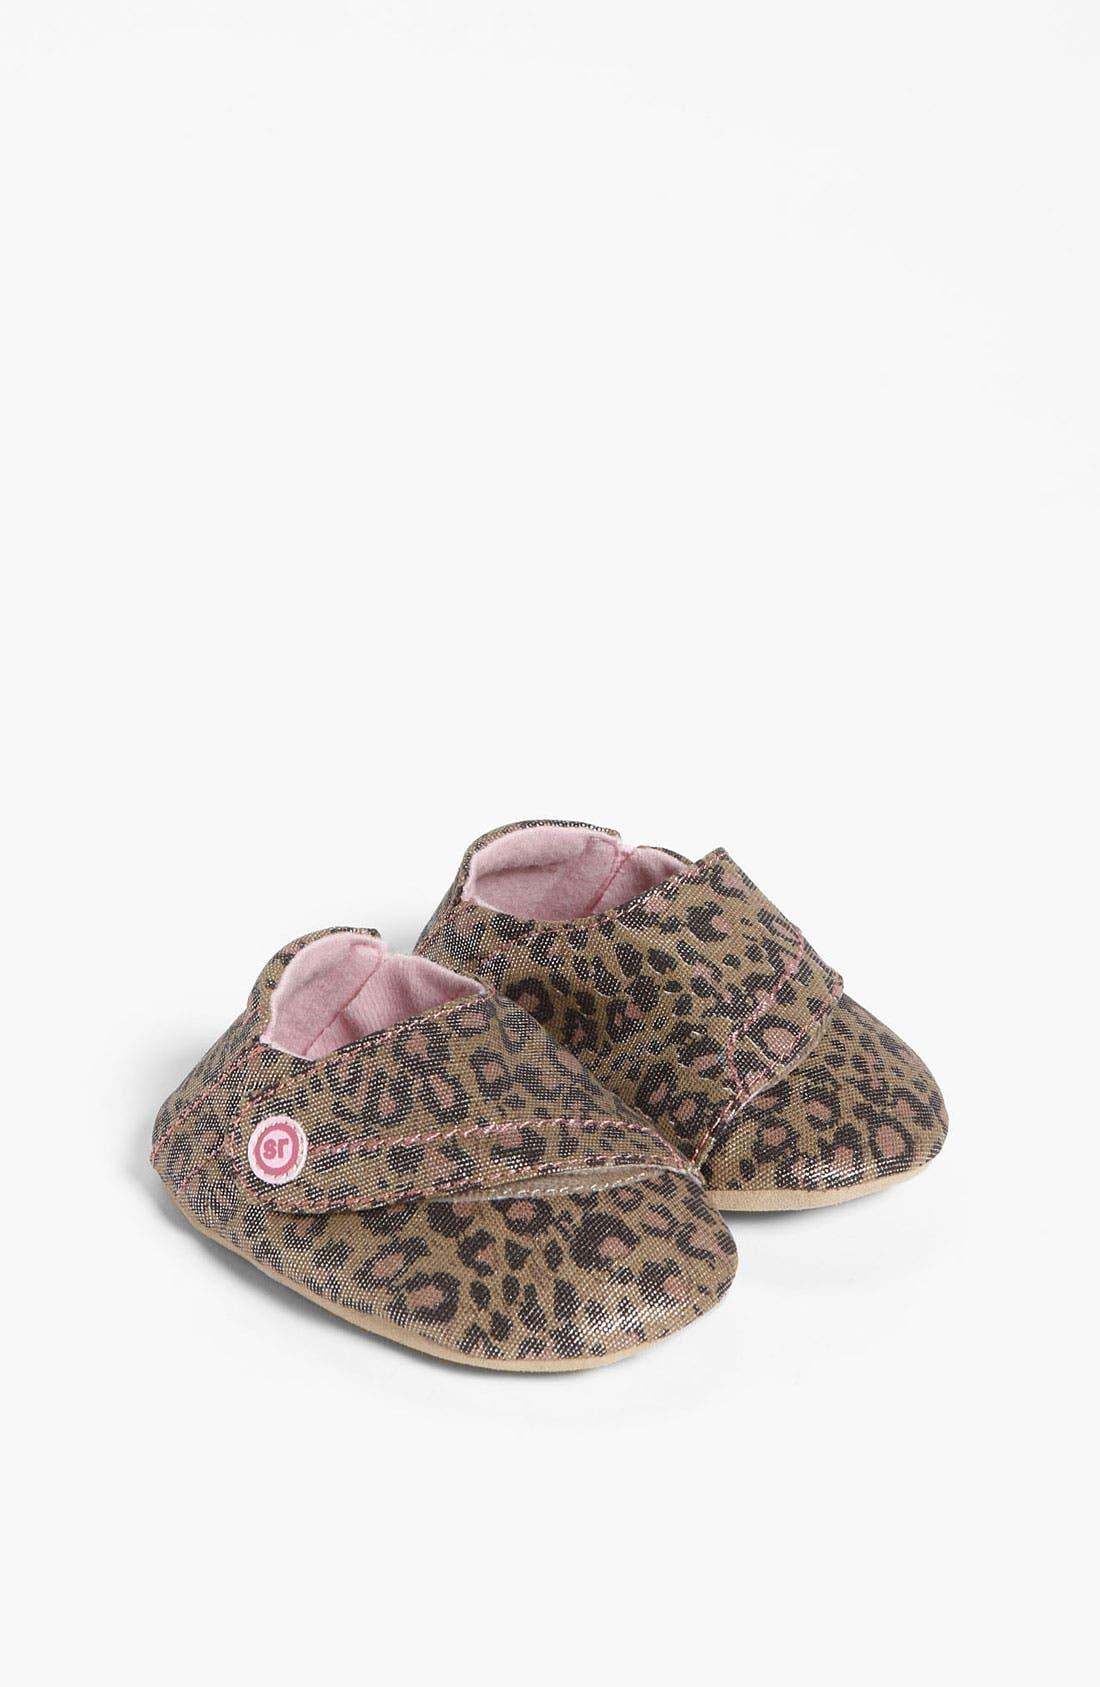 Alternate Image 1 Selected - Stride Rite 'Lush Leopard' Crib Shoe (Baby)